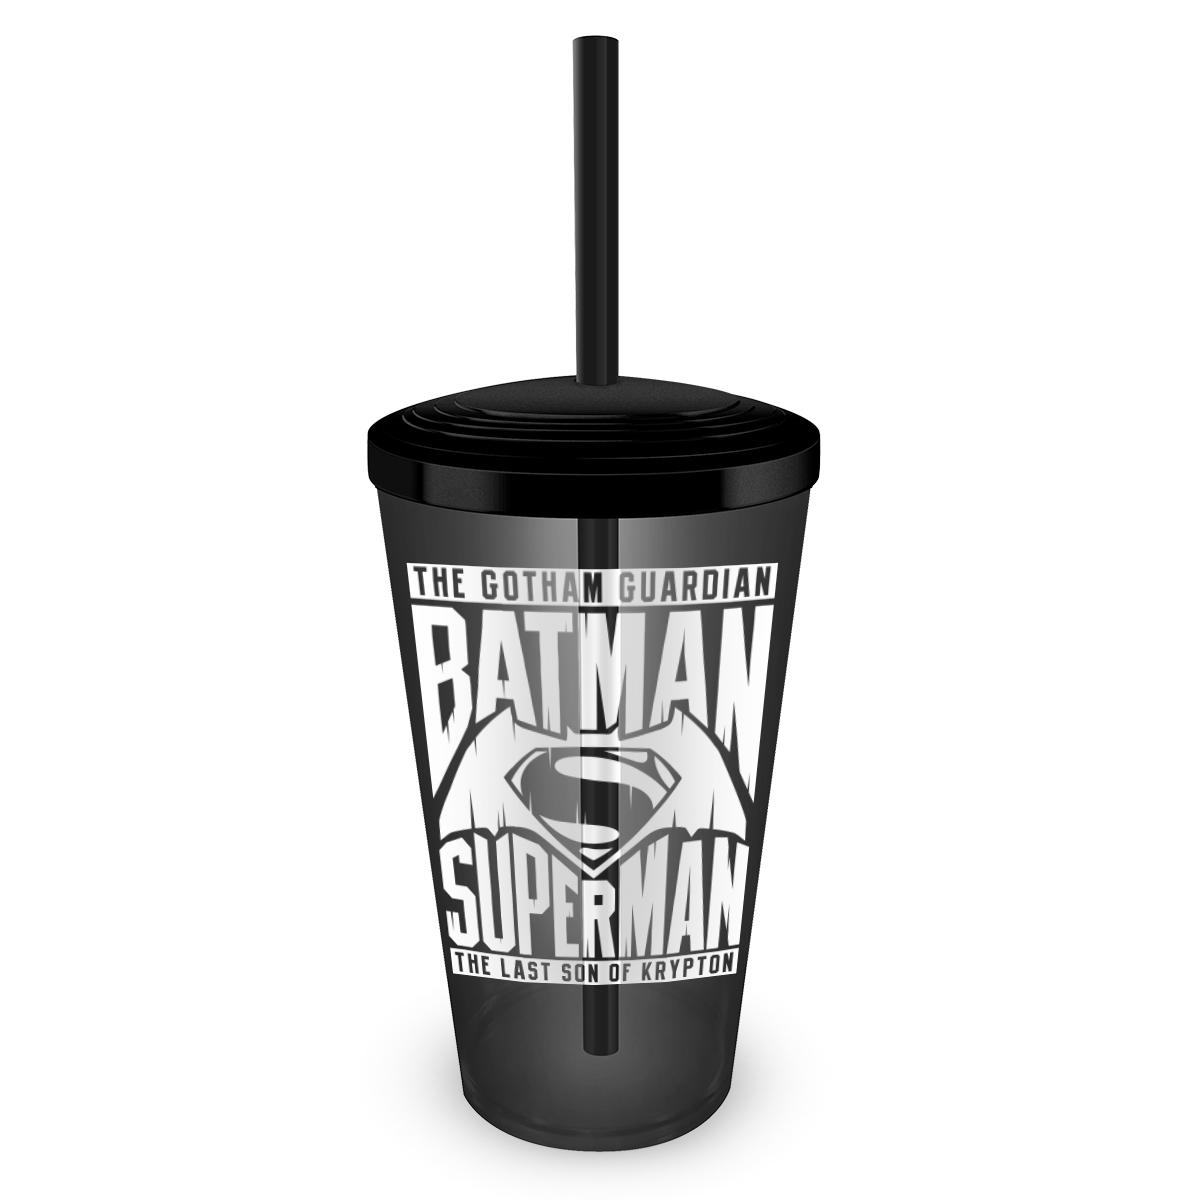 Copo Acrílico Fumê Batman VS Superman The Ultimate